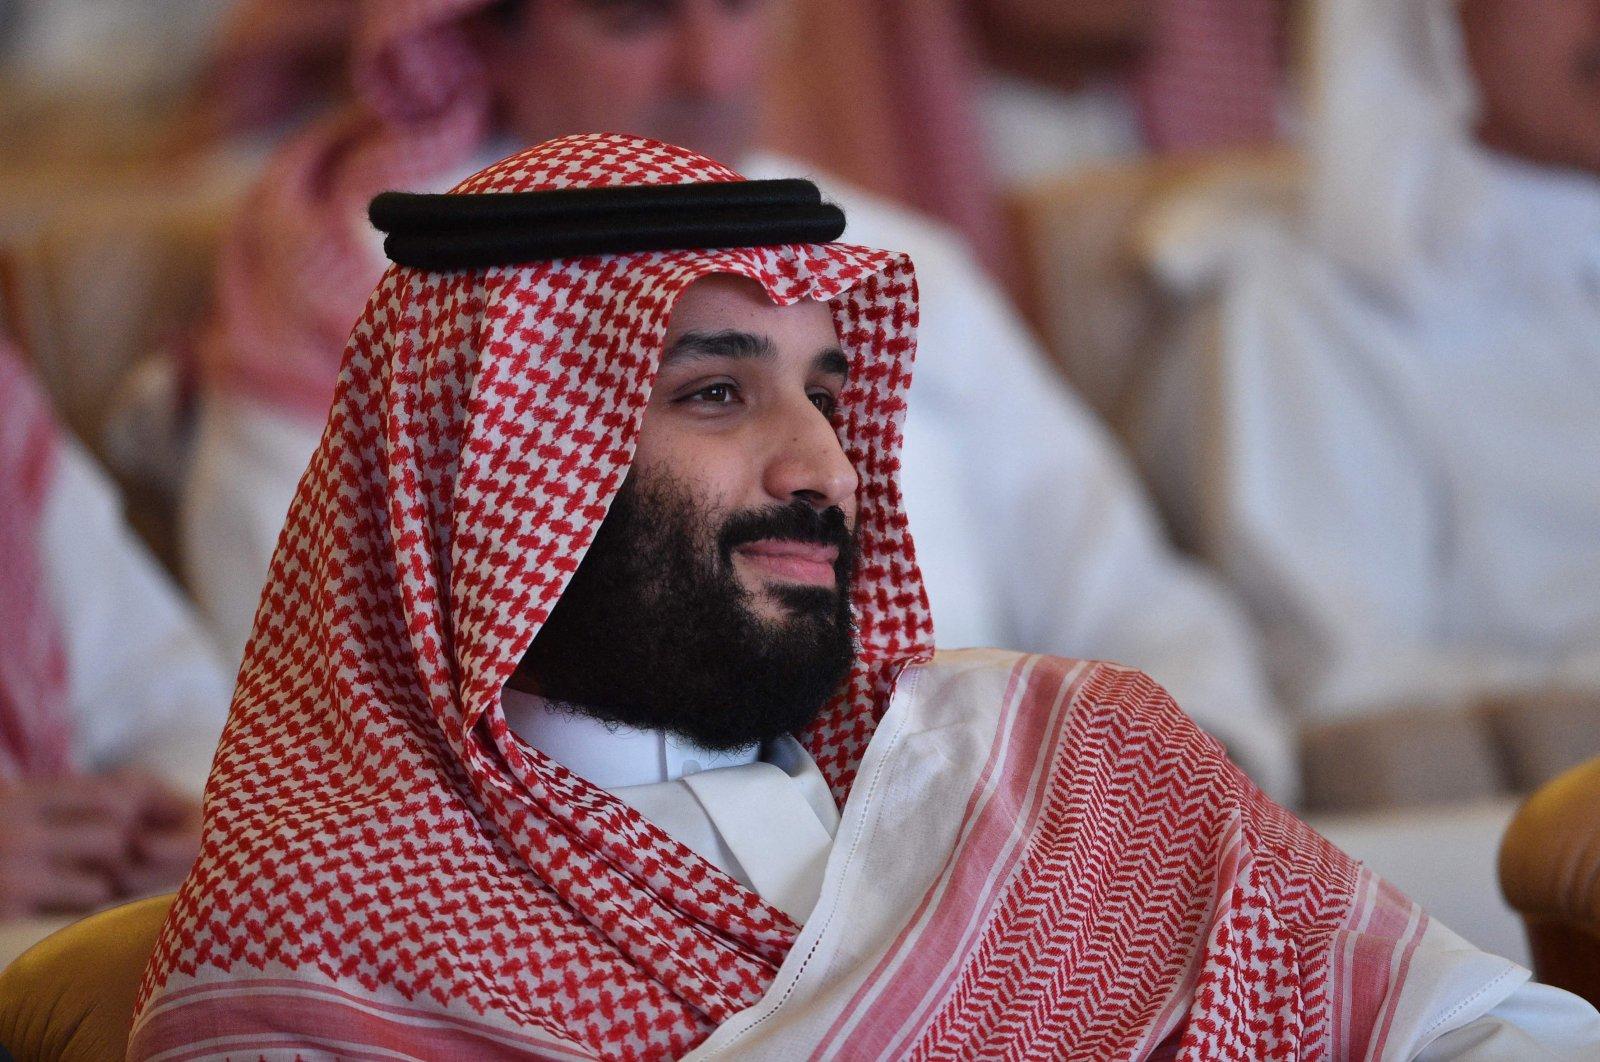 Saudi Arabia's Crown Prince Mohammed bin Salman at the Future Investment Initiative (FII) conference in Riyadh, Saudi Arabia, Oct. 23, 2018. (AFP)